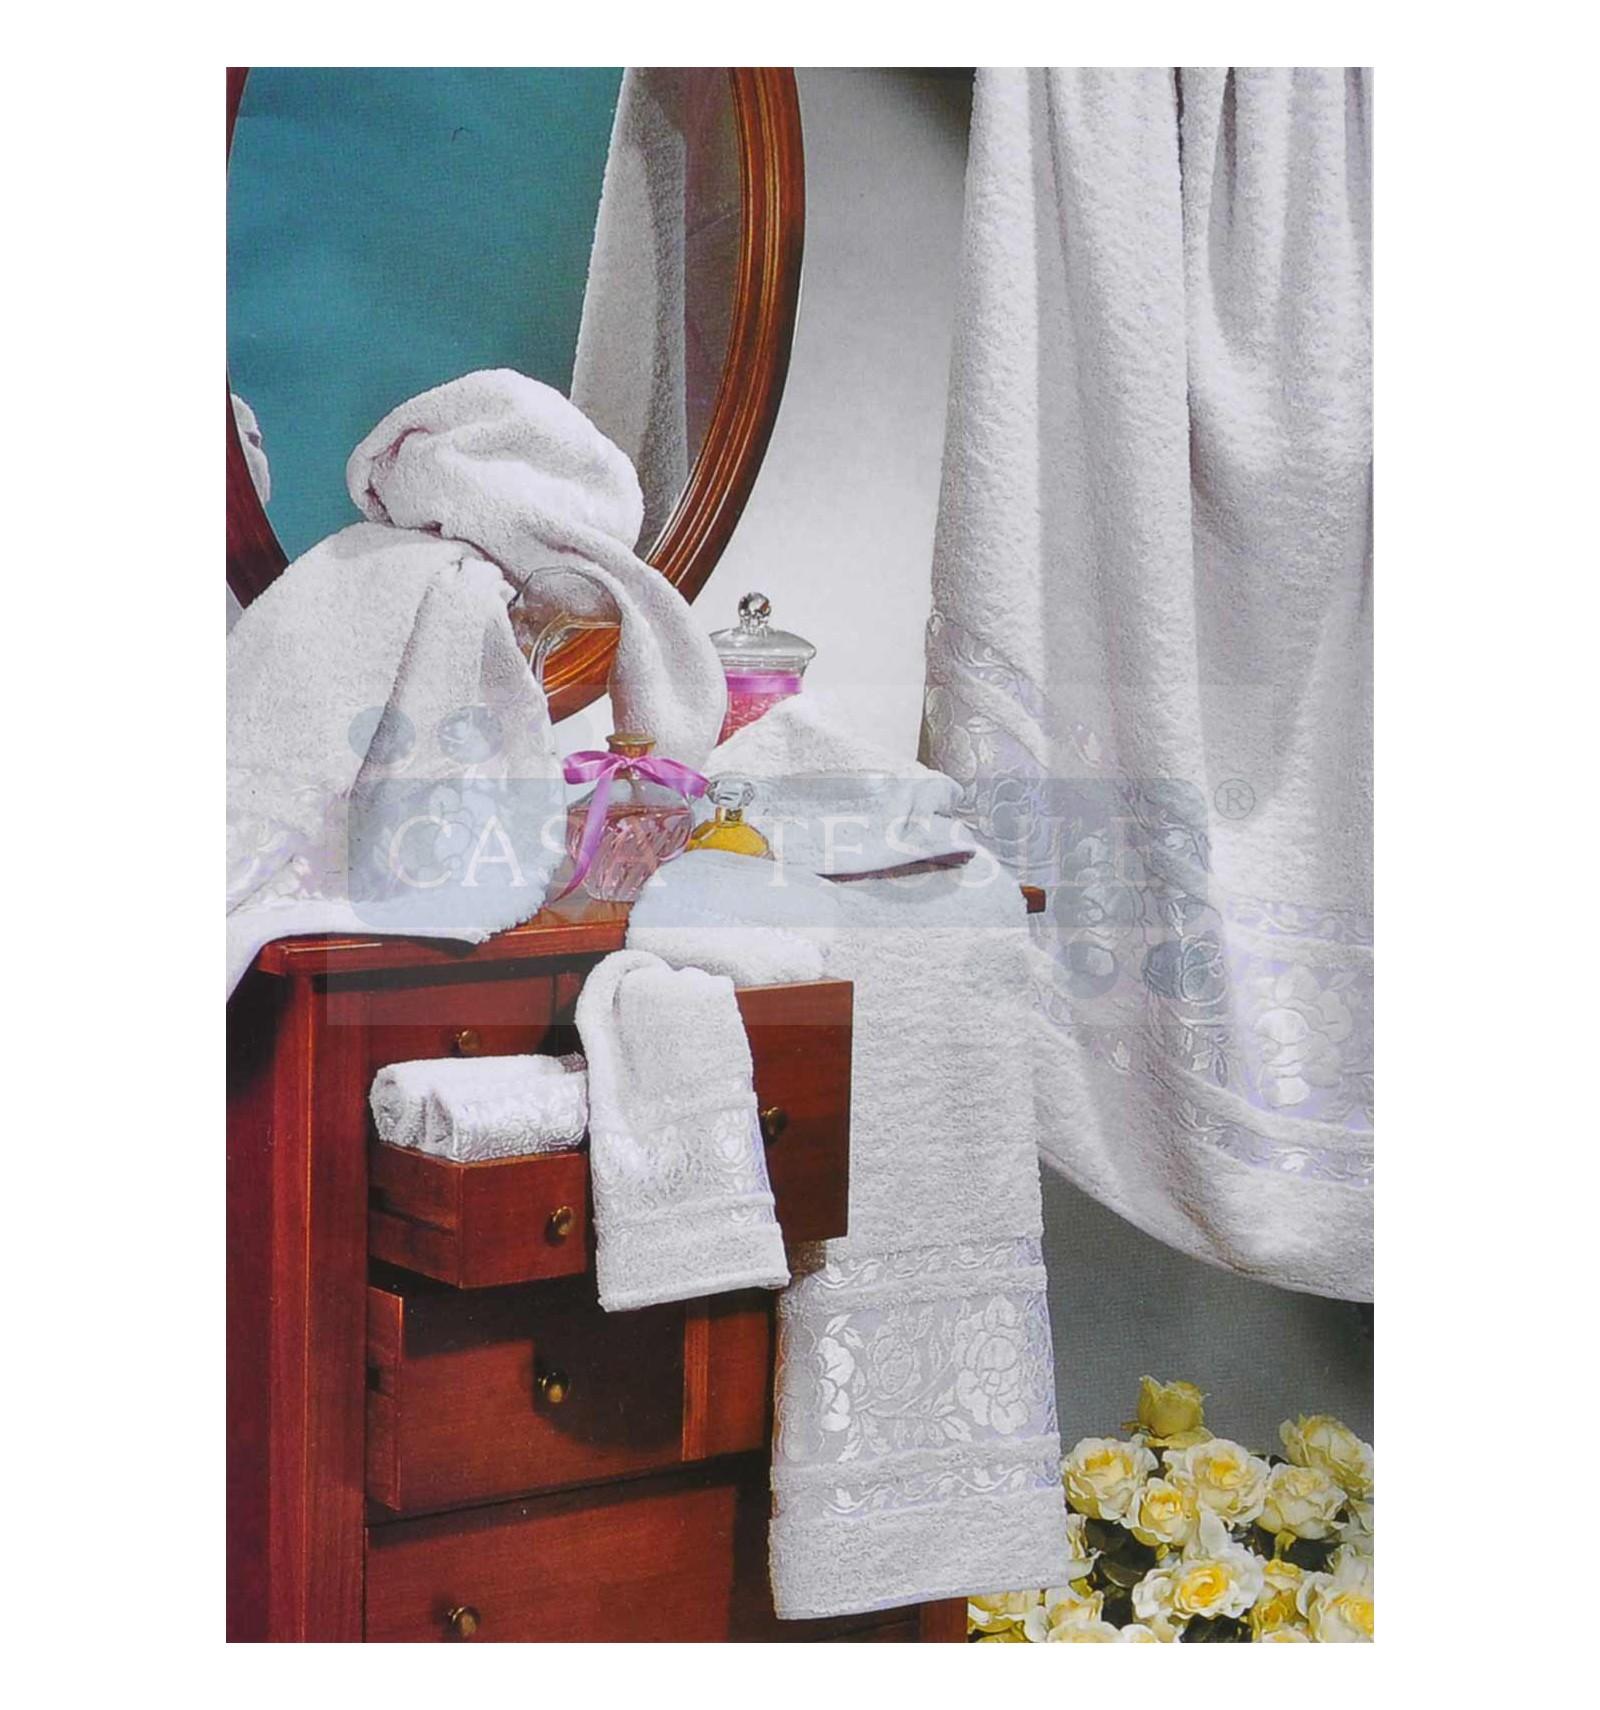 Rose set 5 pz asciugamani coordinati casa tessile - Coordinati bagno ...